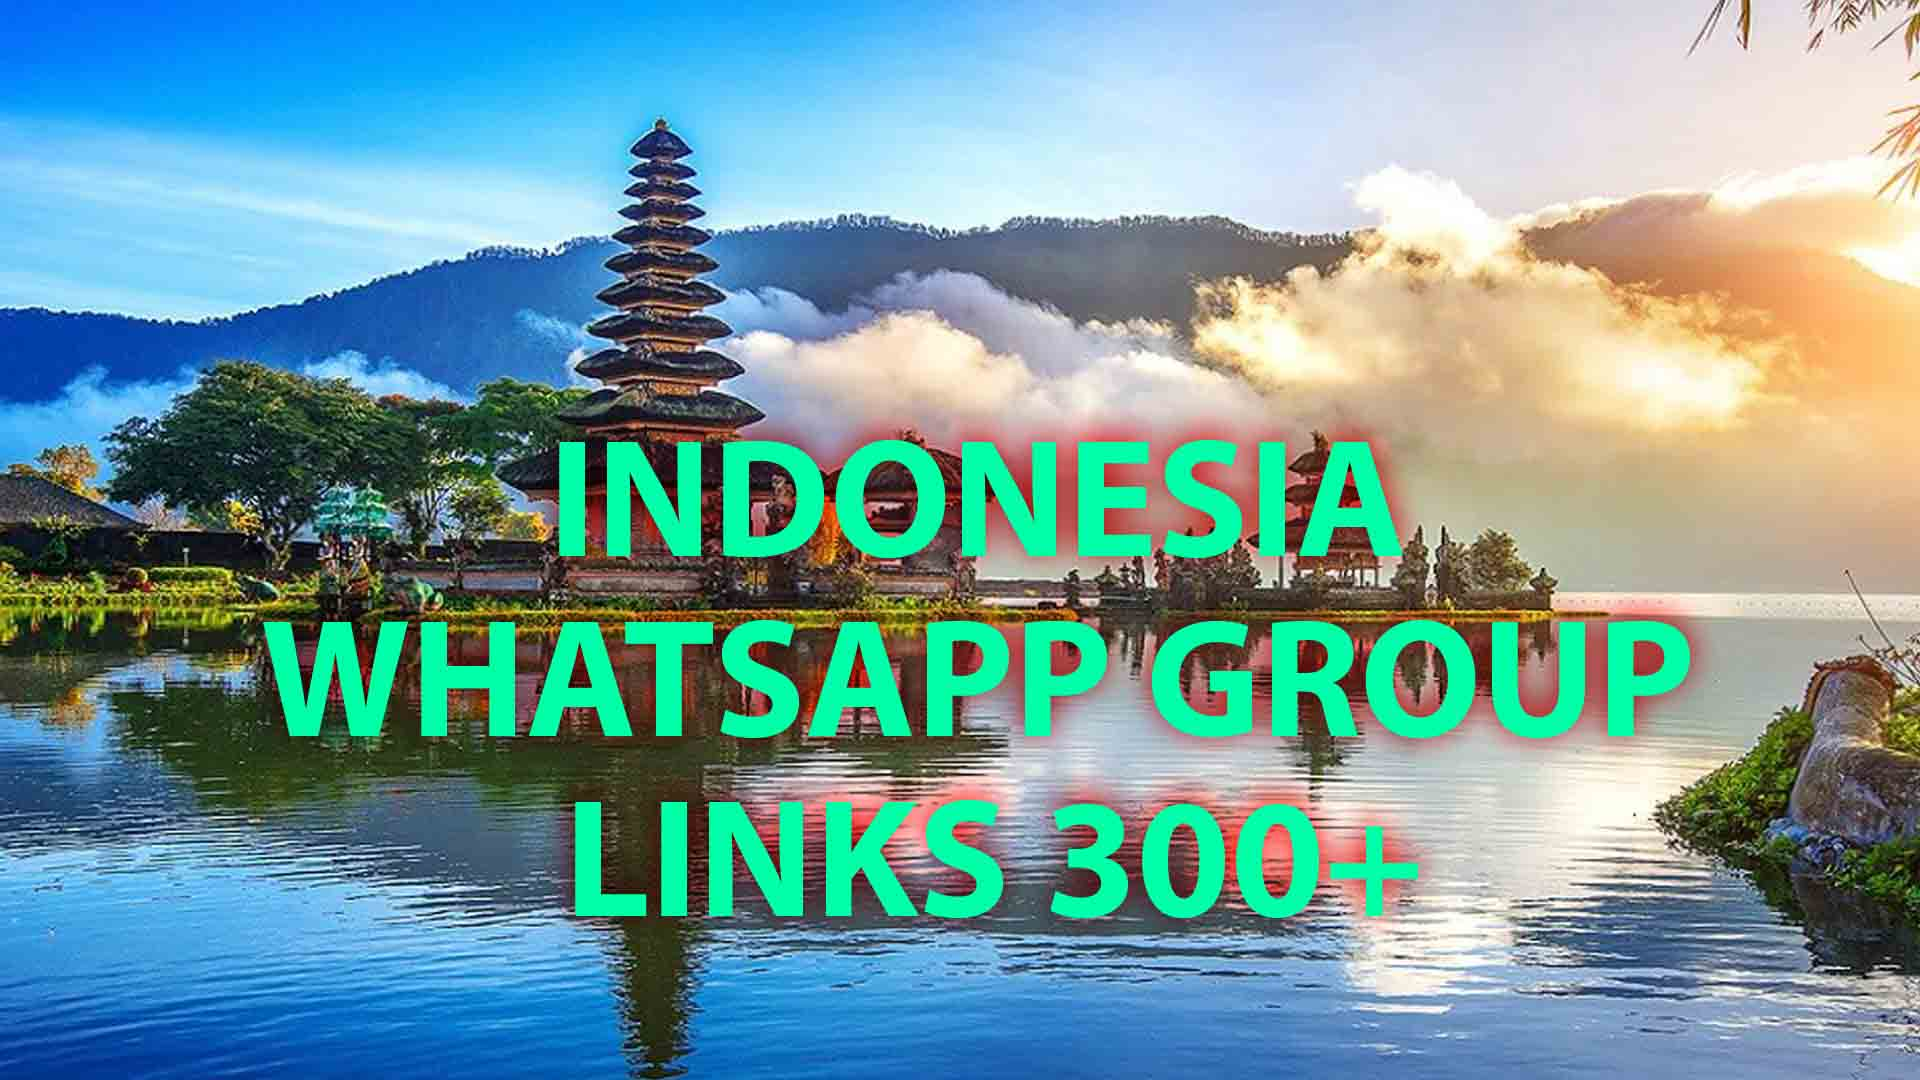 Indonesia whatsapp group Links 300+